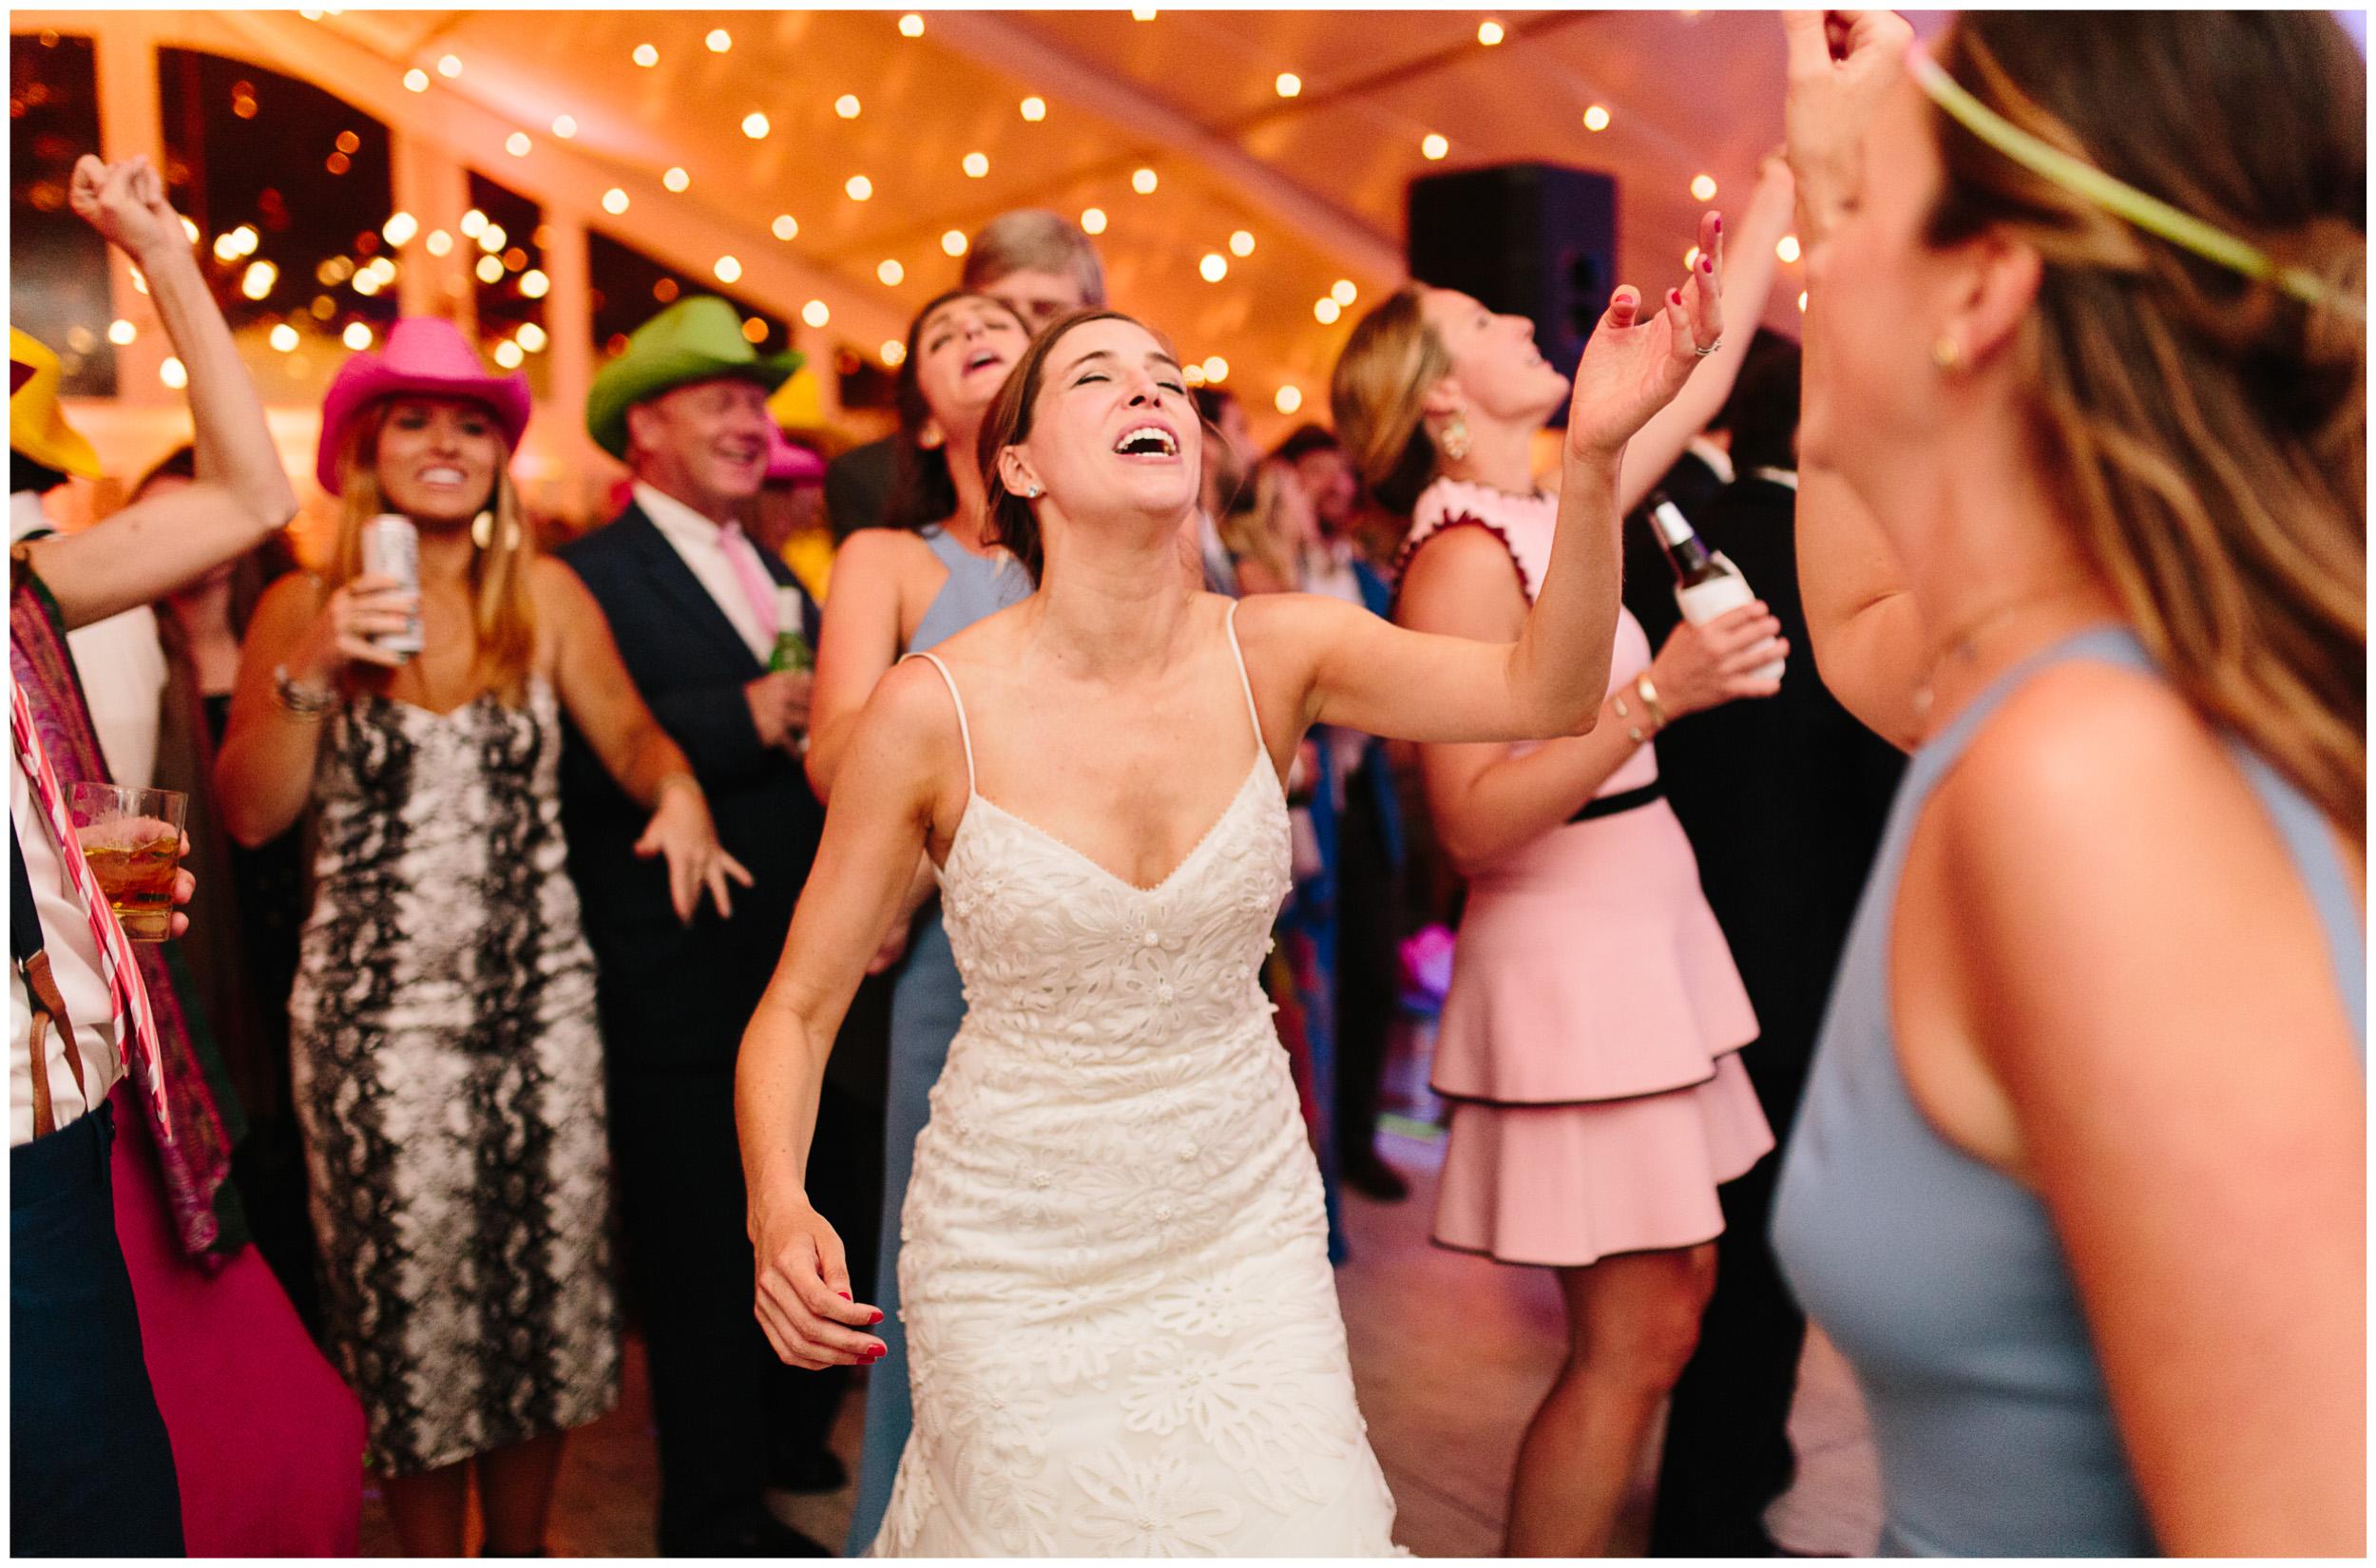 crested_butte_wedding_132.jpg